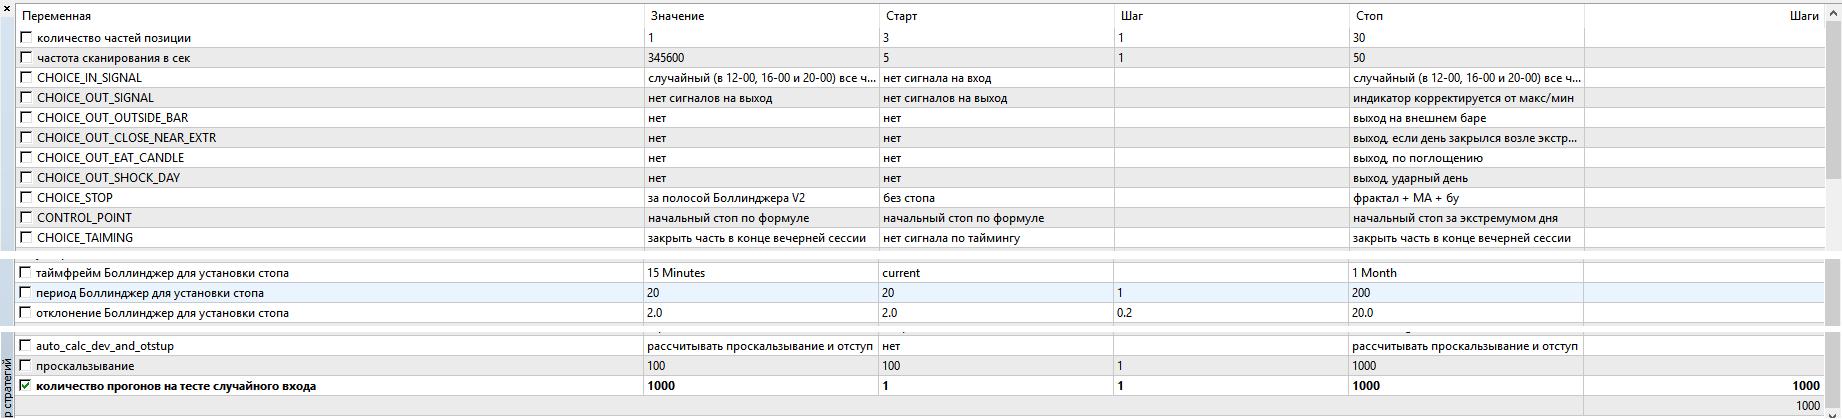 Настройка параметров для теста трейлинг стопа на основе индикатора канал Боллинджера